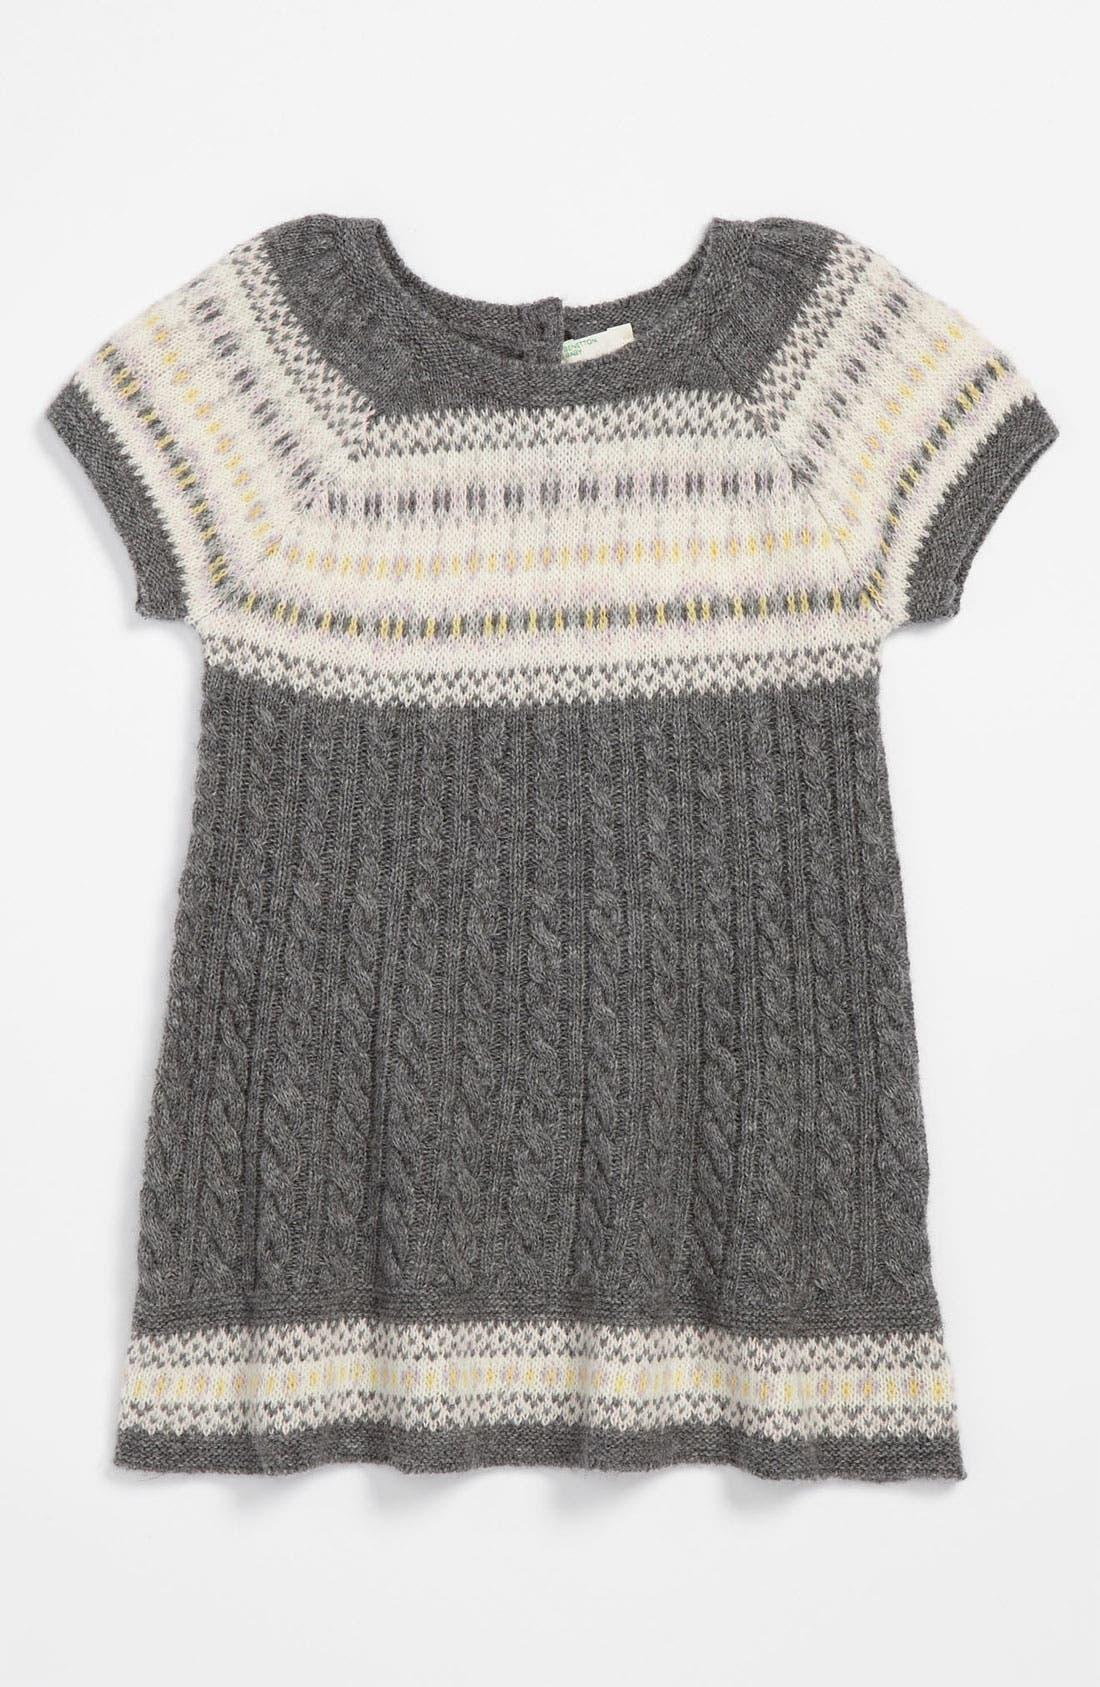 Alternate Image 1 Selected - United Colors of Benetton Kids Knit Dress (Infant)